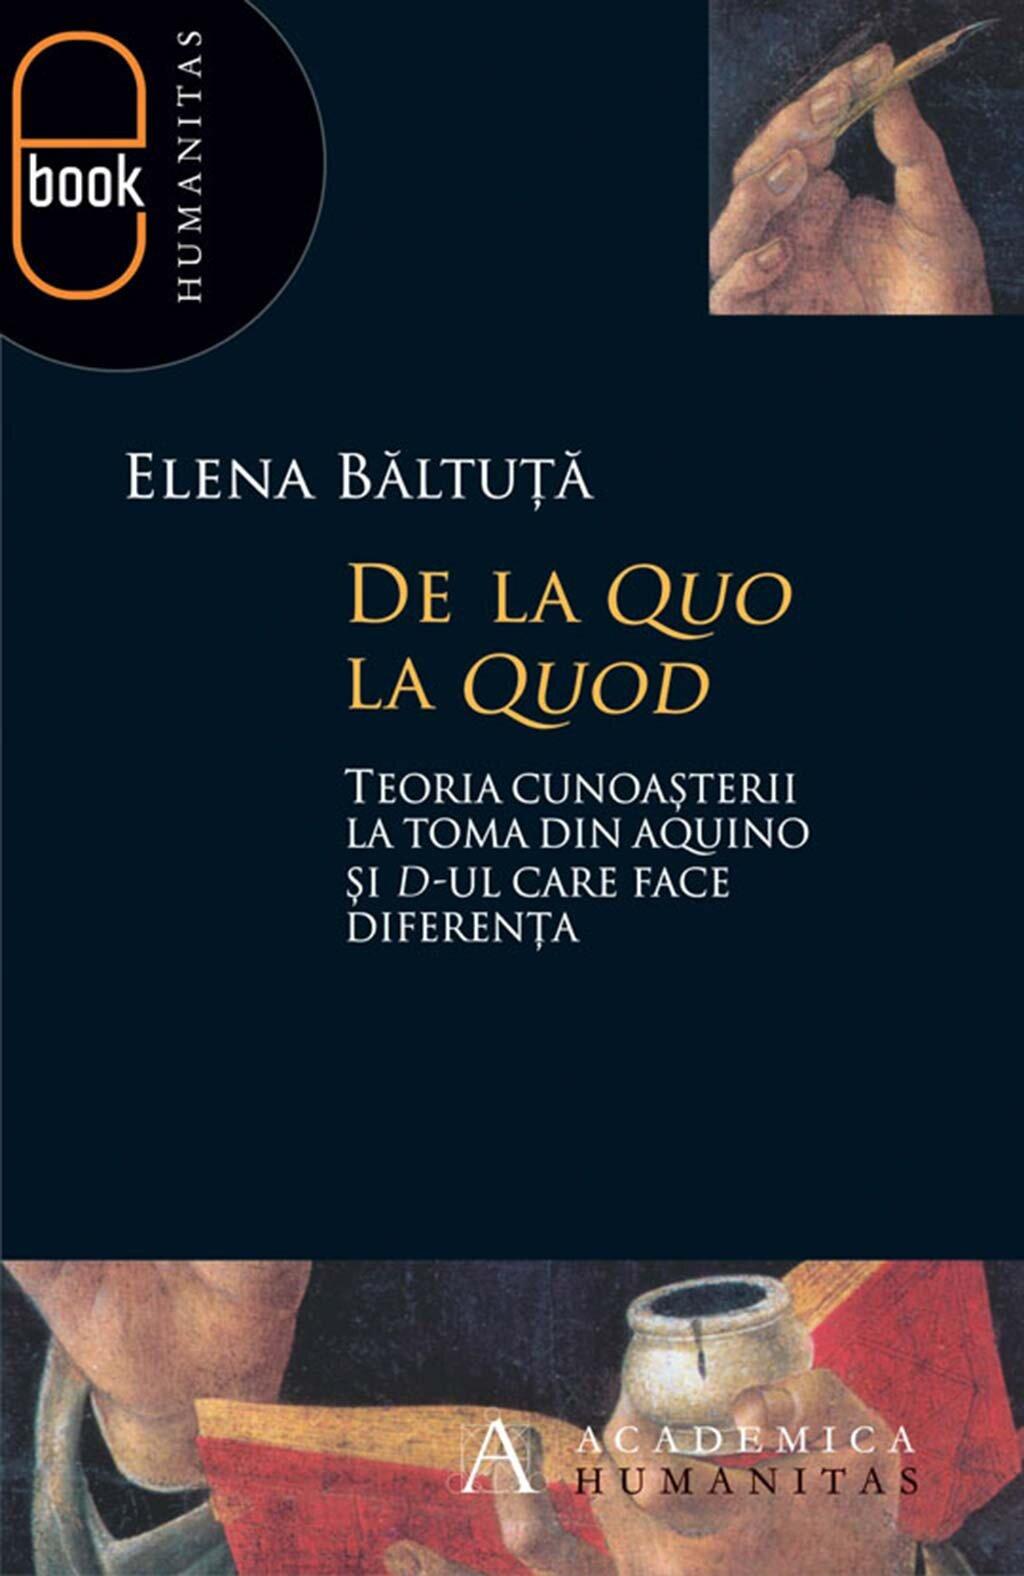 De la quo la quod. Teoria cunoasterii la Toma din Aquino si D-ul care face diferenta (eBook)